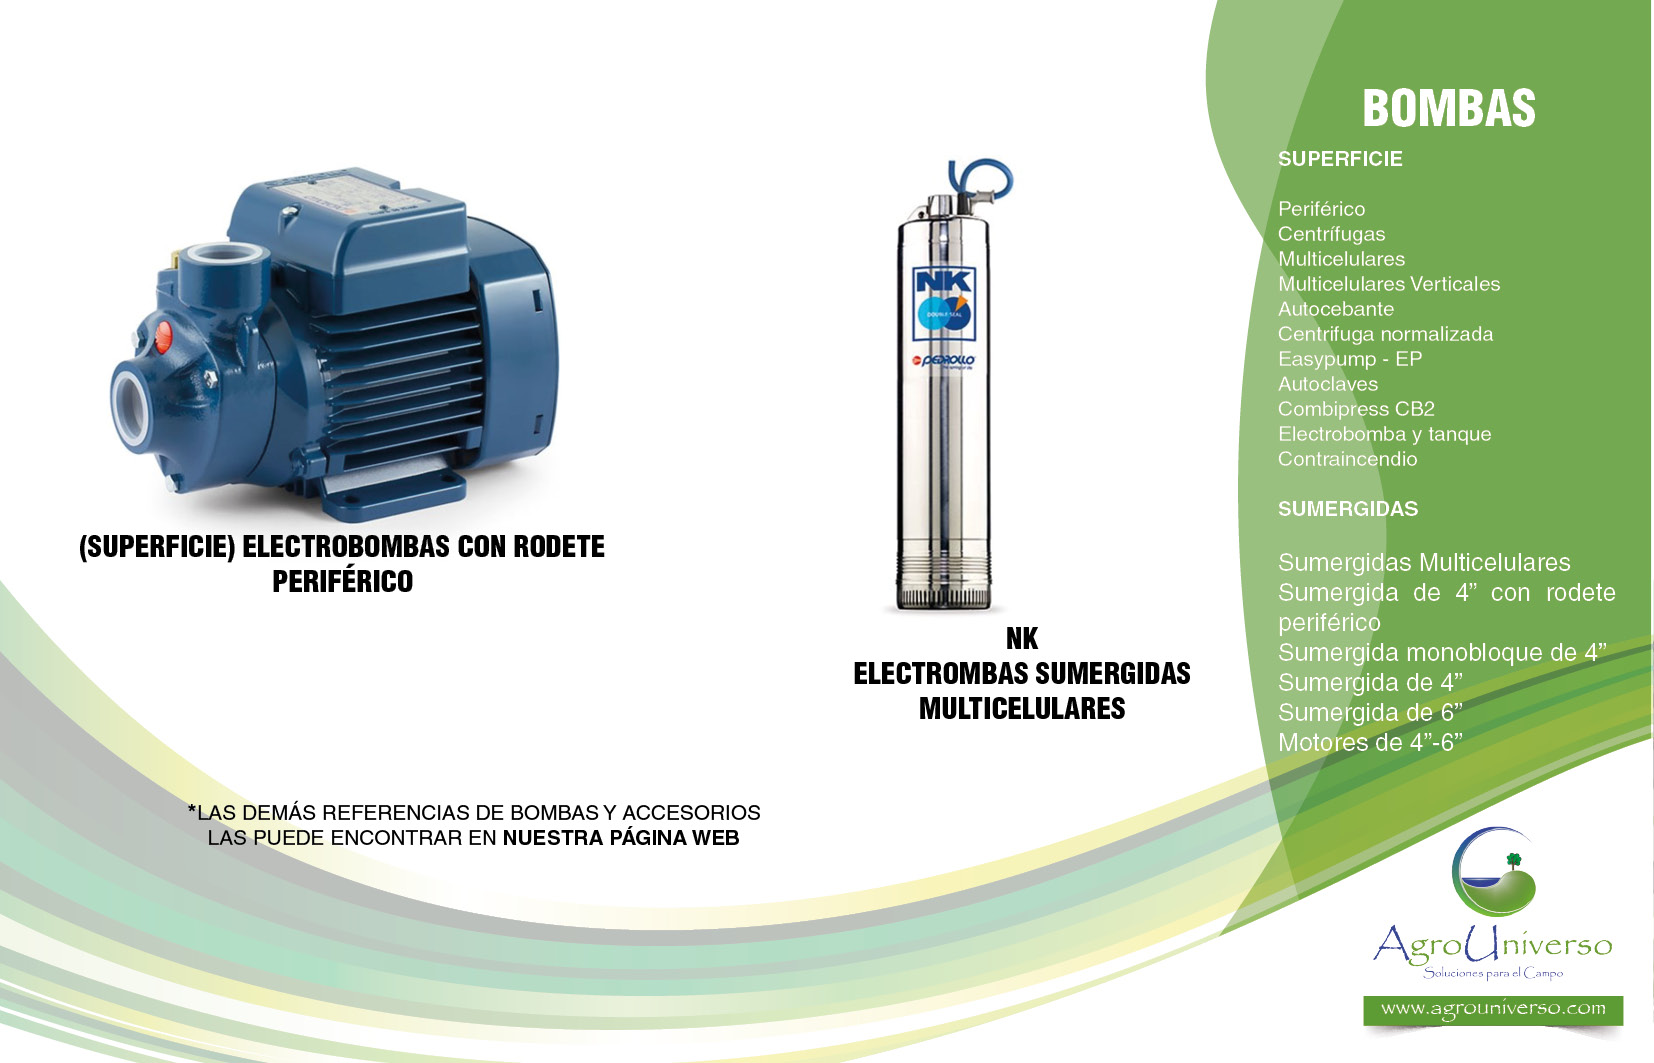 Catlogo-de-productos-Agrouniverso-30